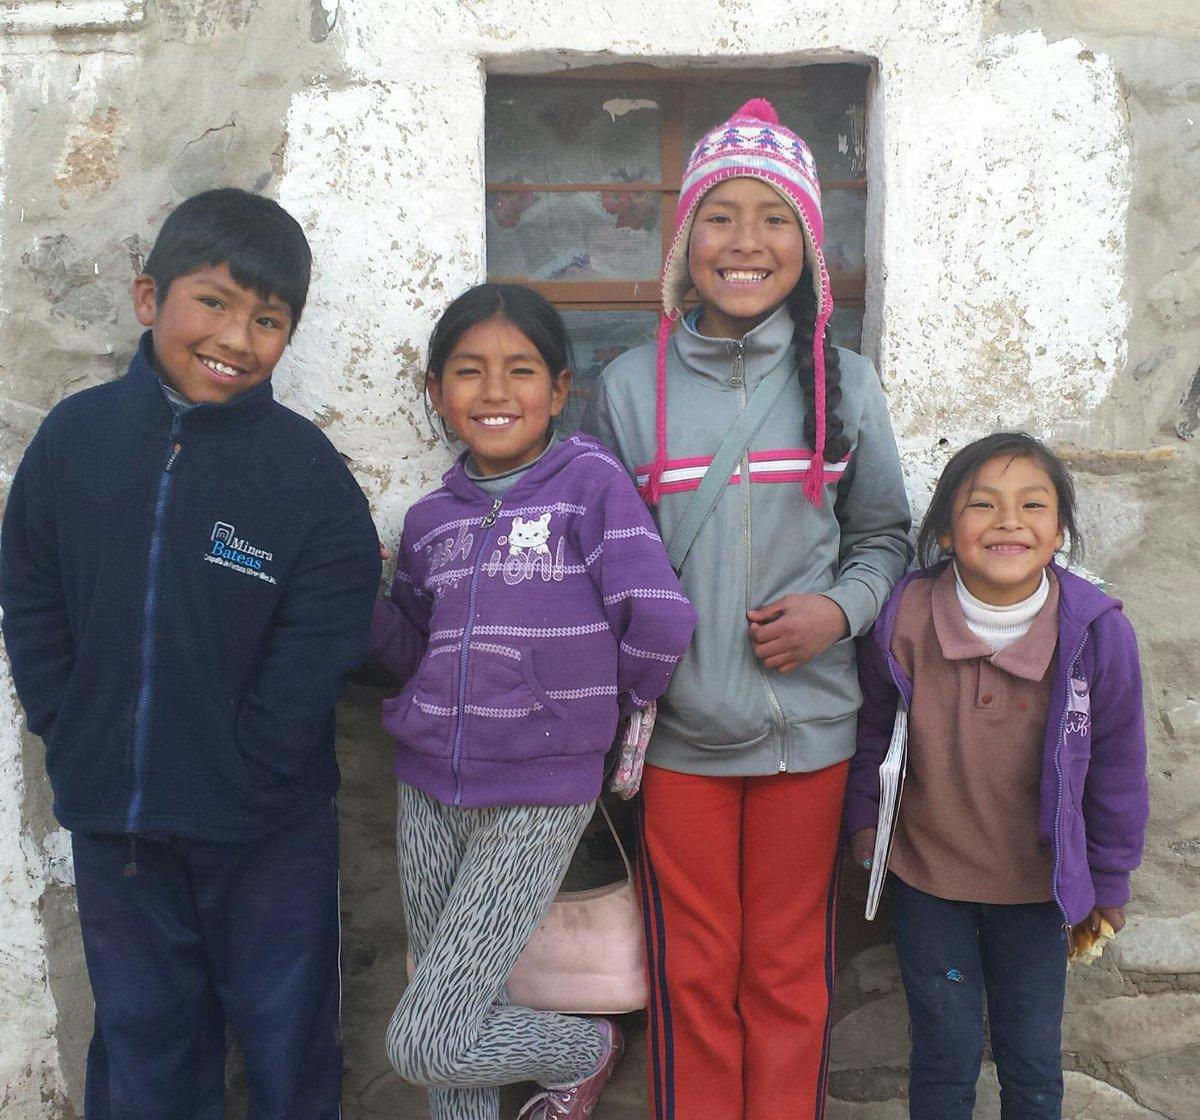 Everywhere I go I see microfinance transforming children's futures @wildheartsteam Peru http://t.co/0NKUU5kPMX